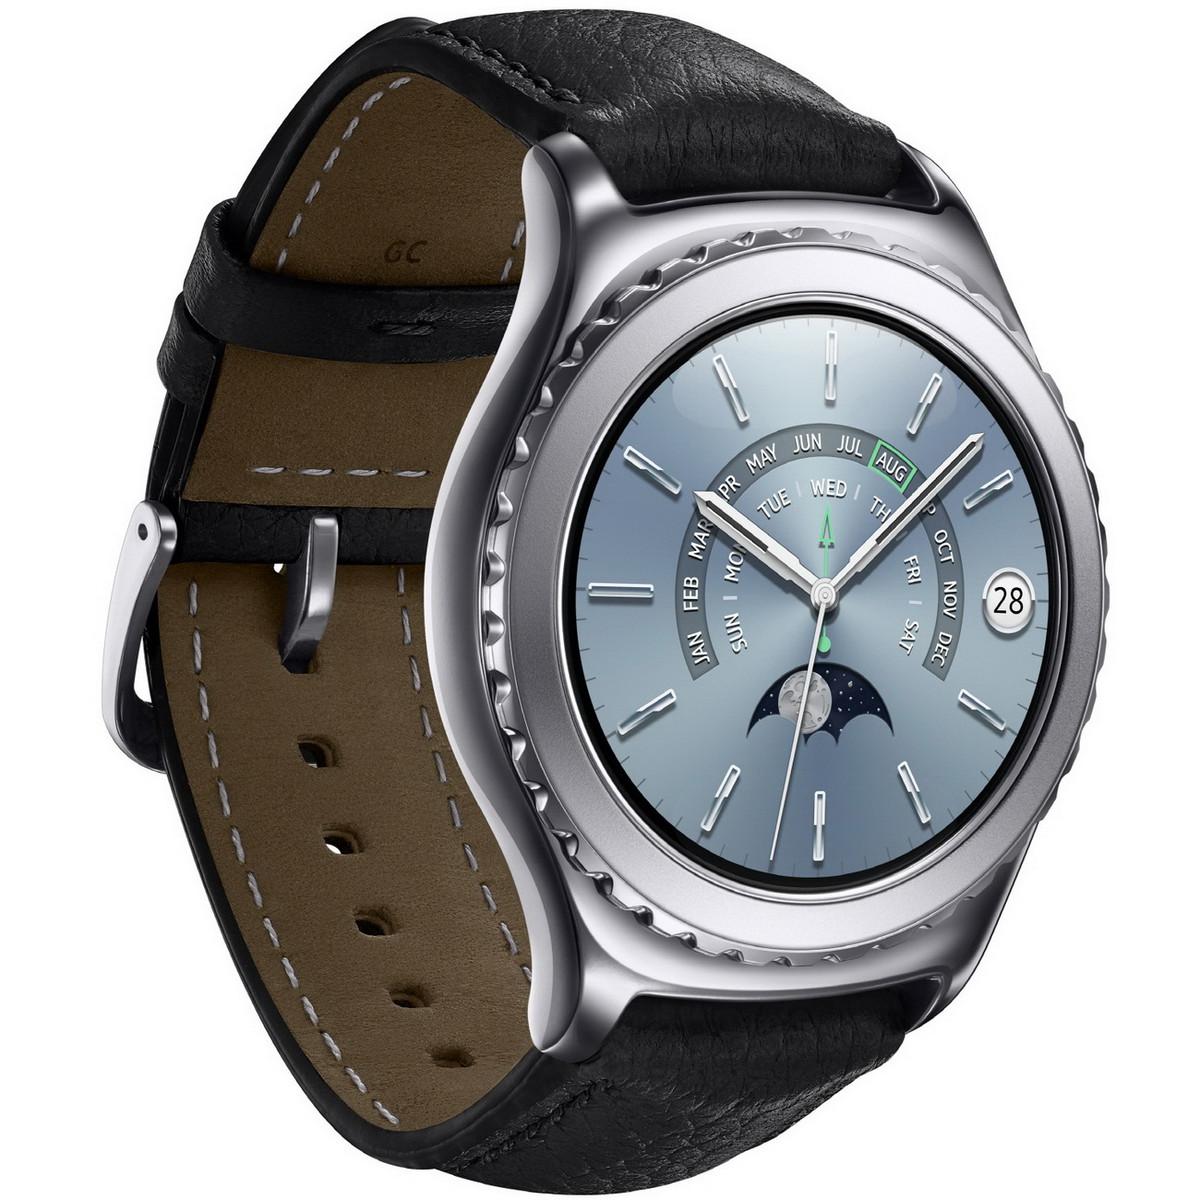 samsung gear s2 classic  smartwatches in platinum und rose gold ab februar